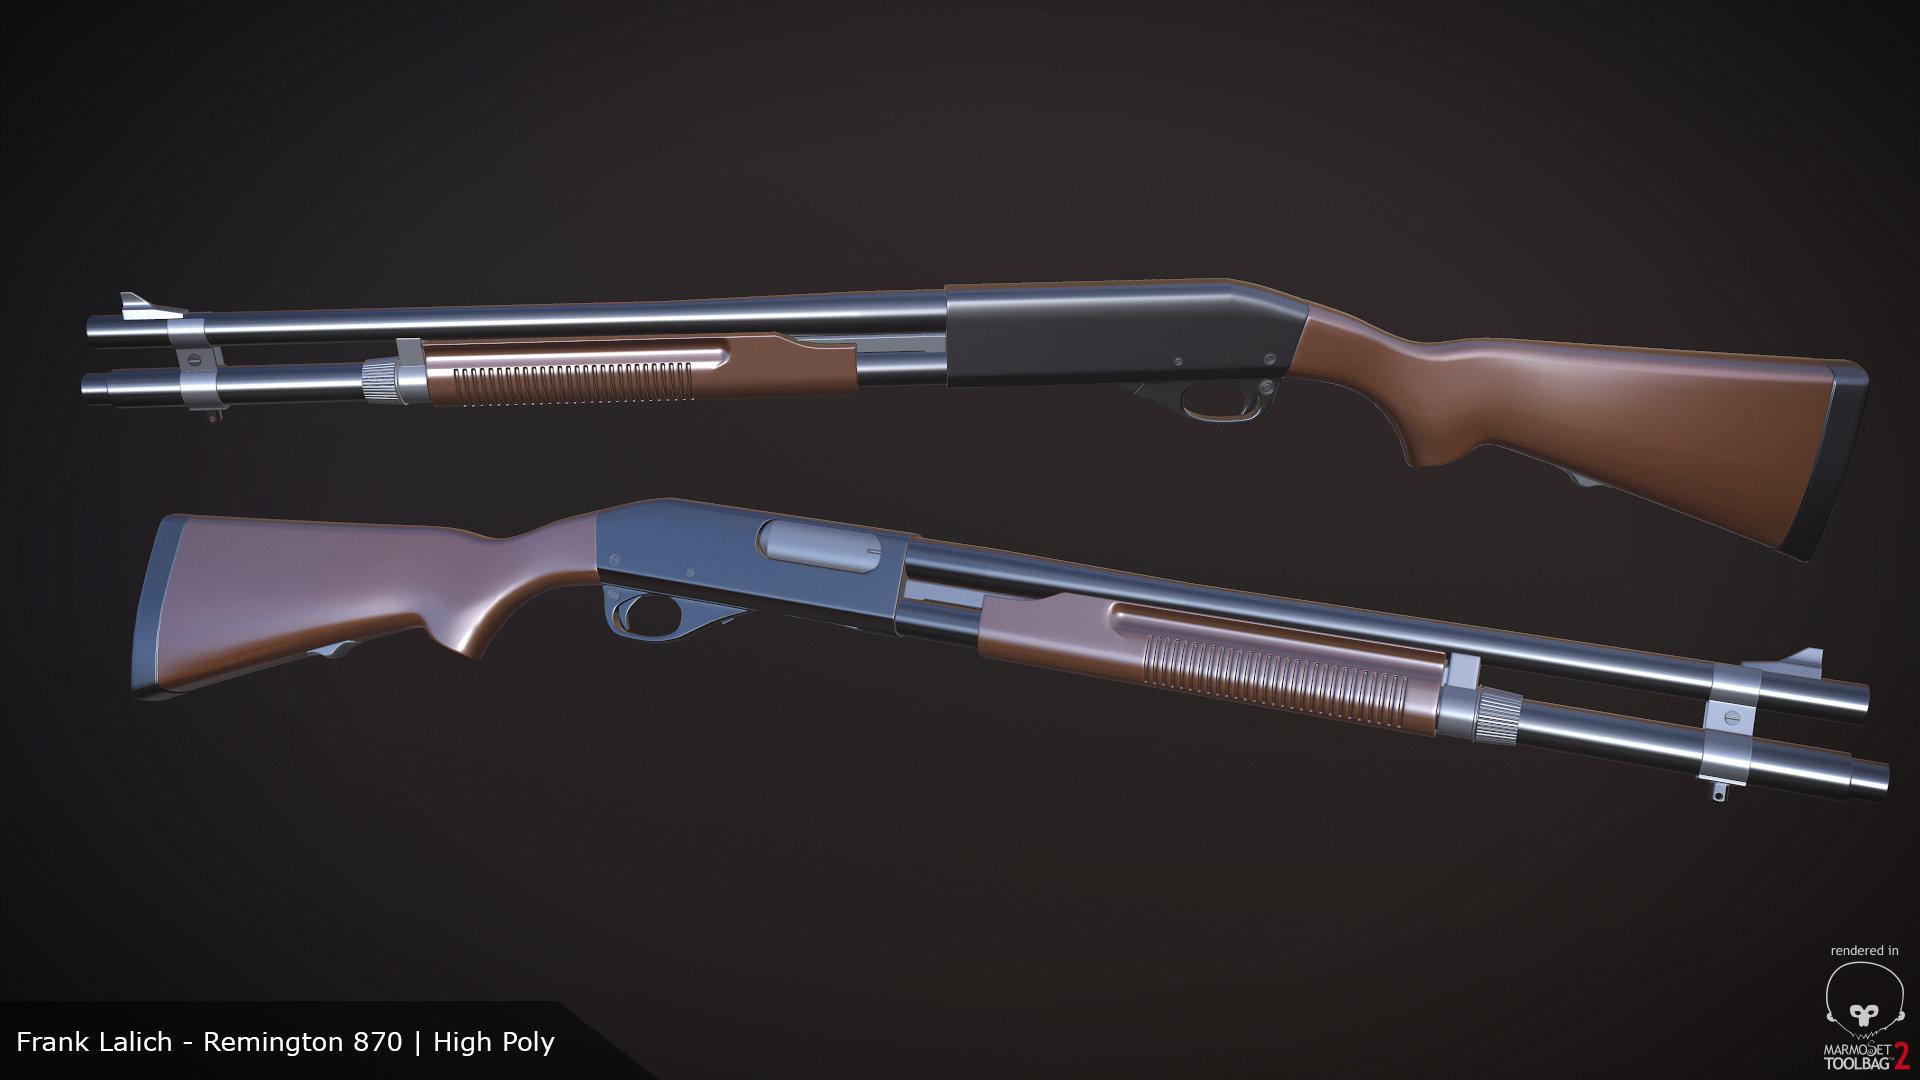 frank-lalich-franklalich-remington870-08.jpg?1435553051